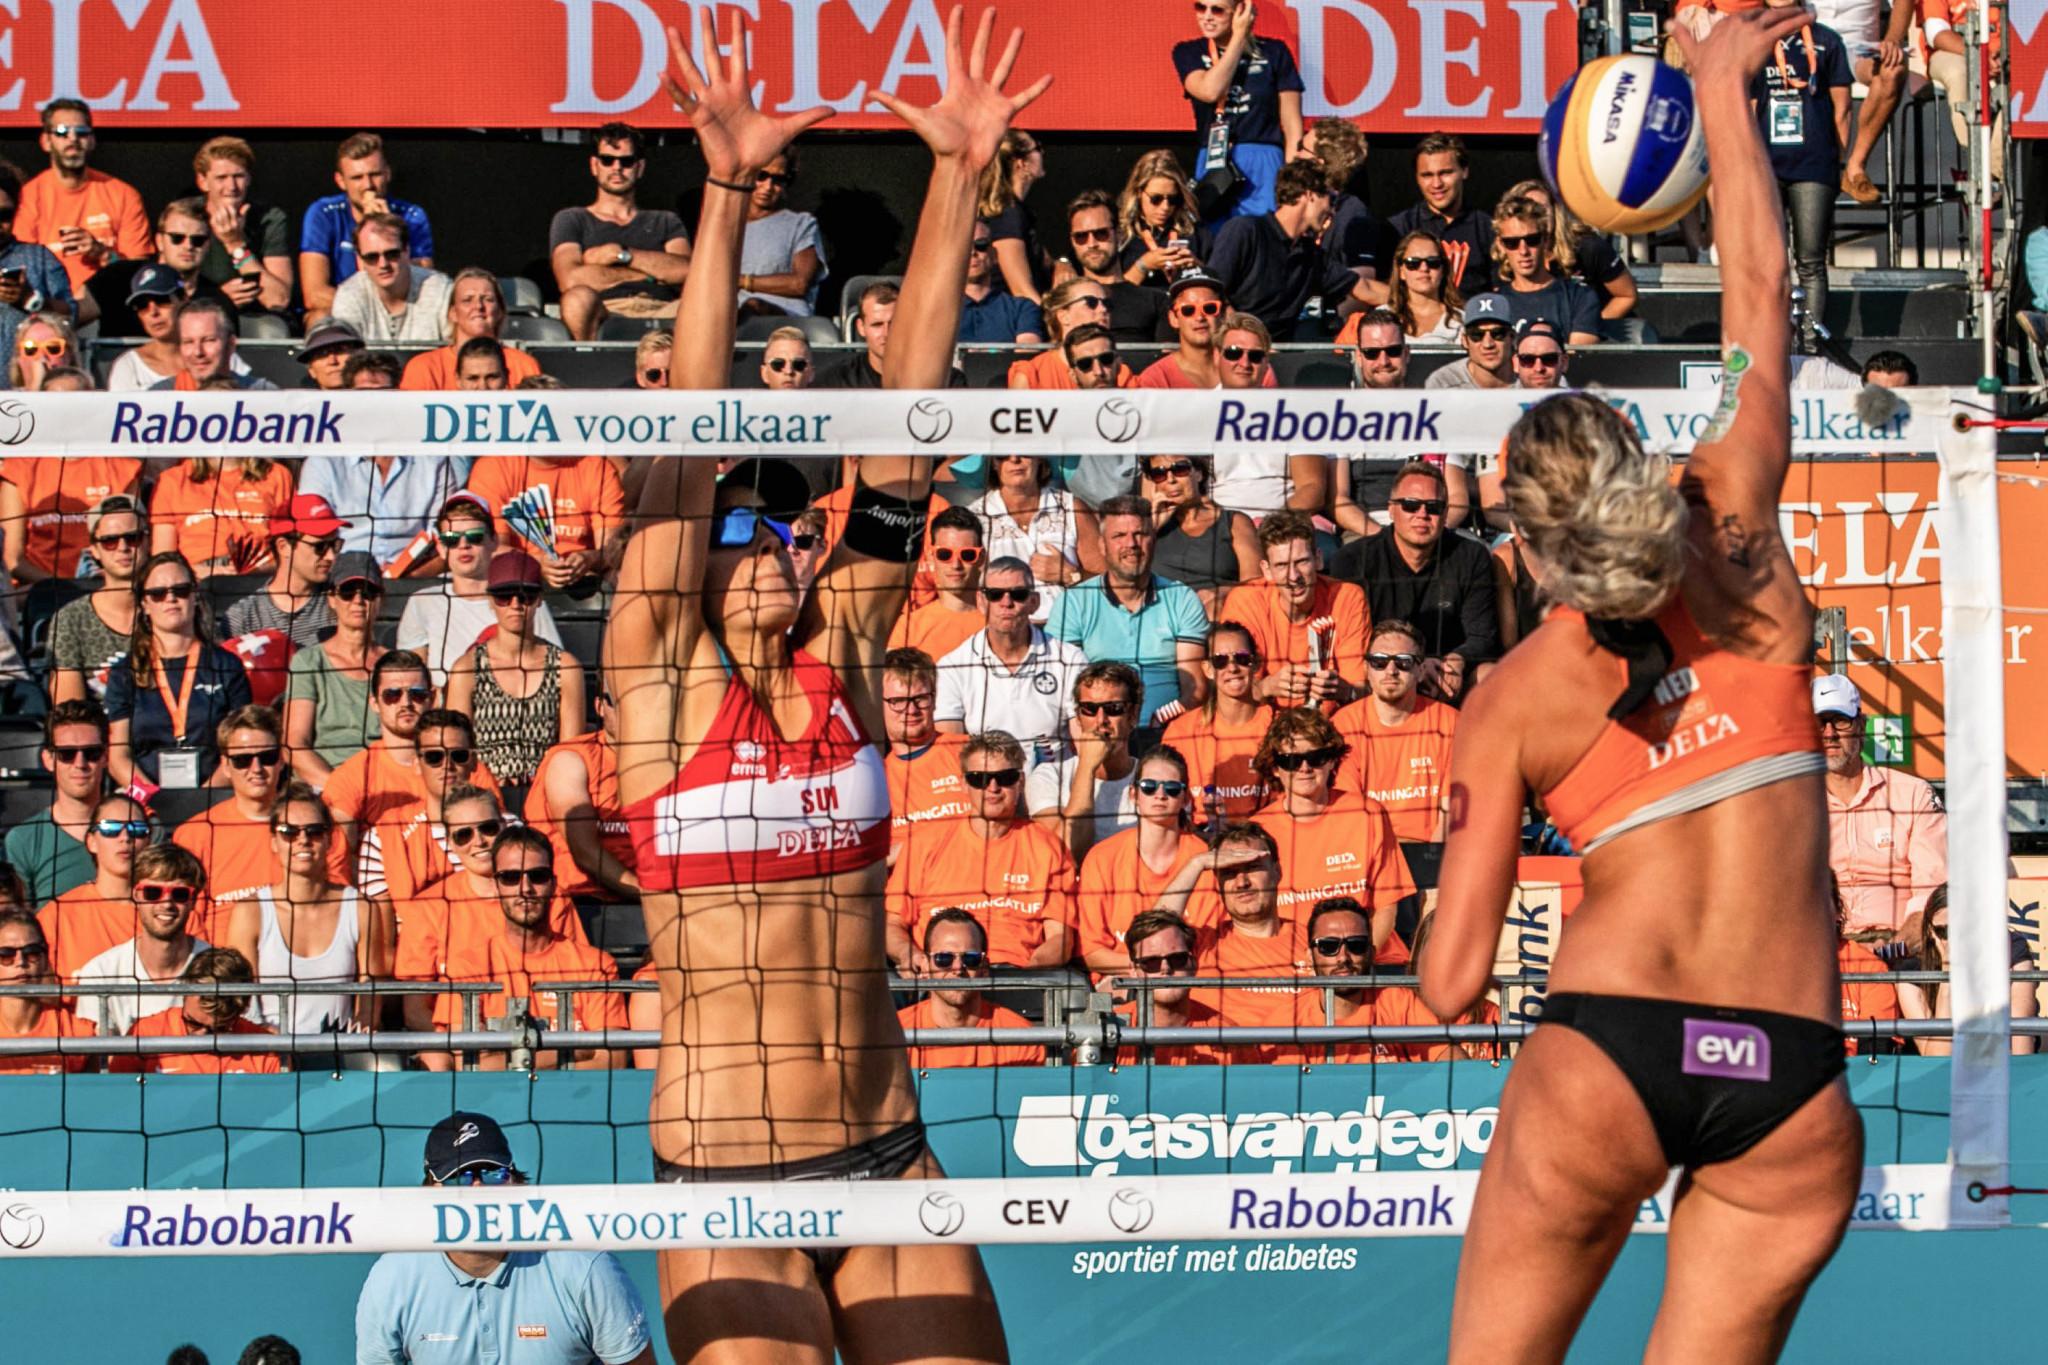 Dutch duo clinch women's title at European Beach Volleyball Championships